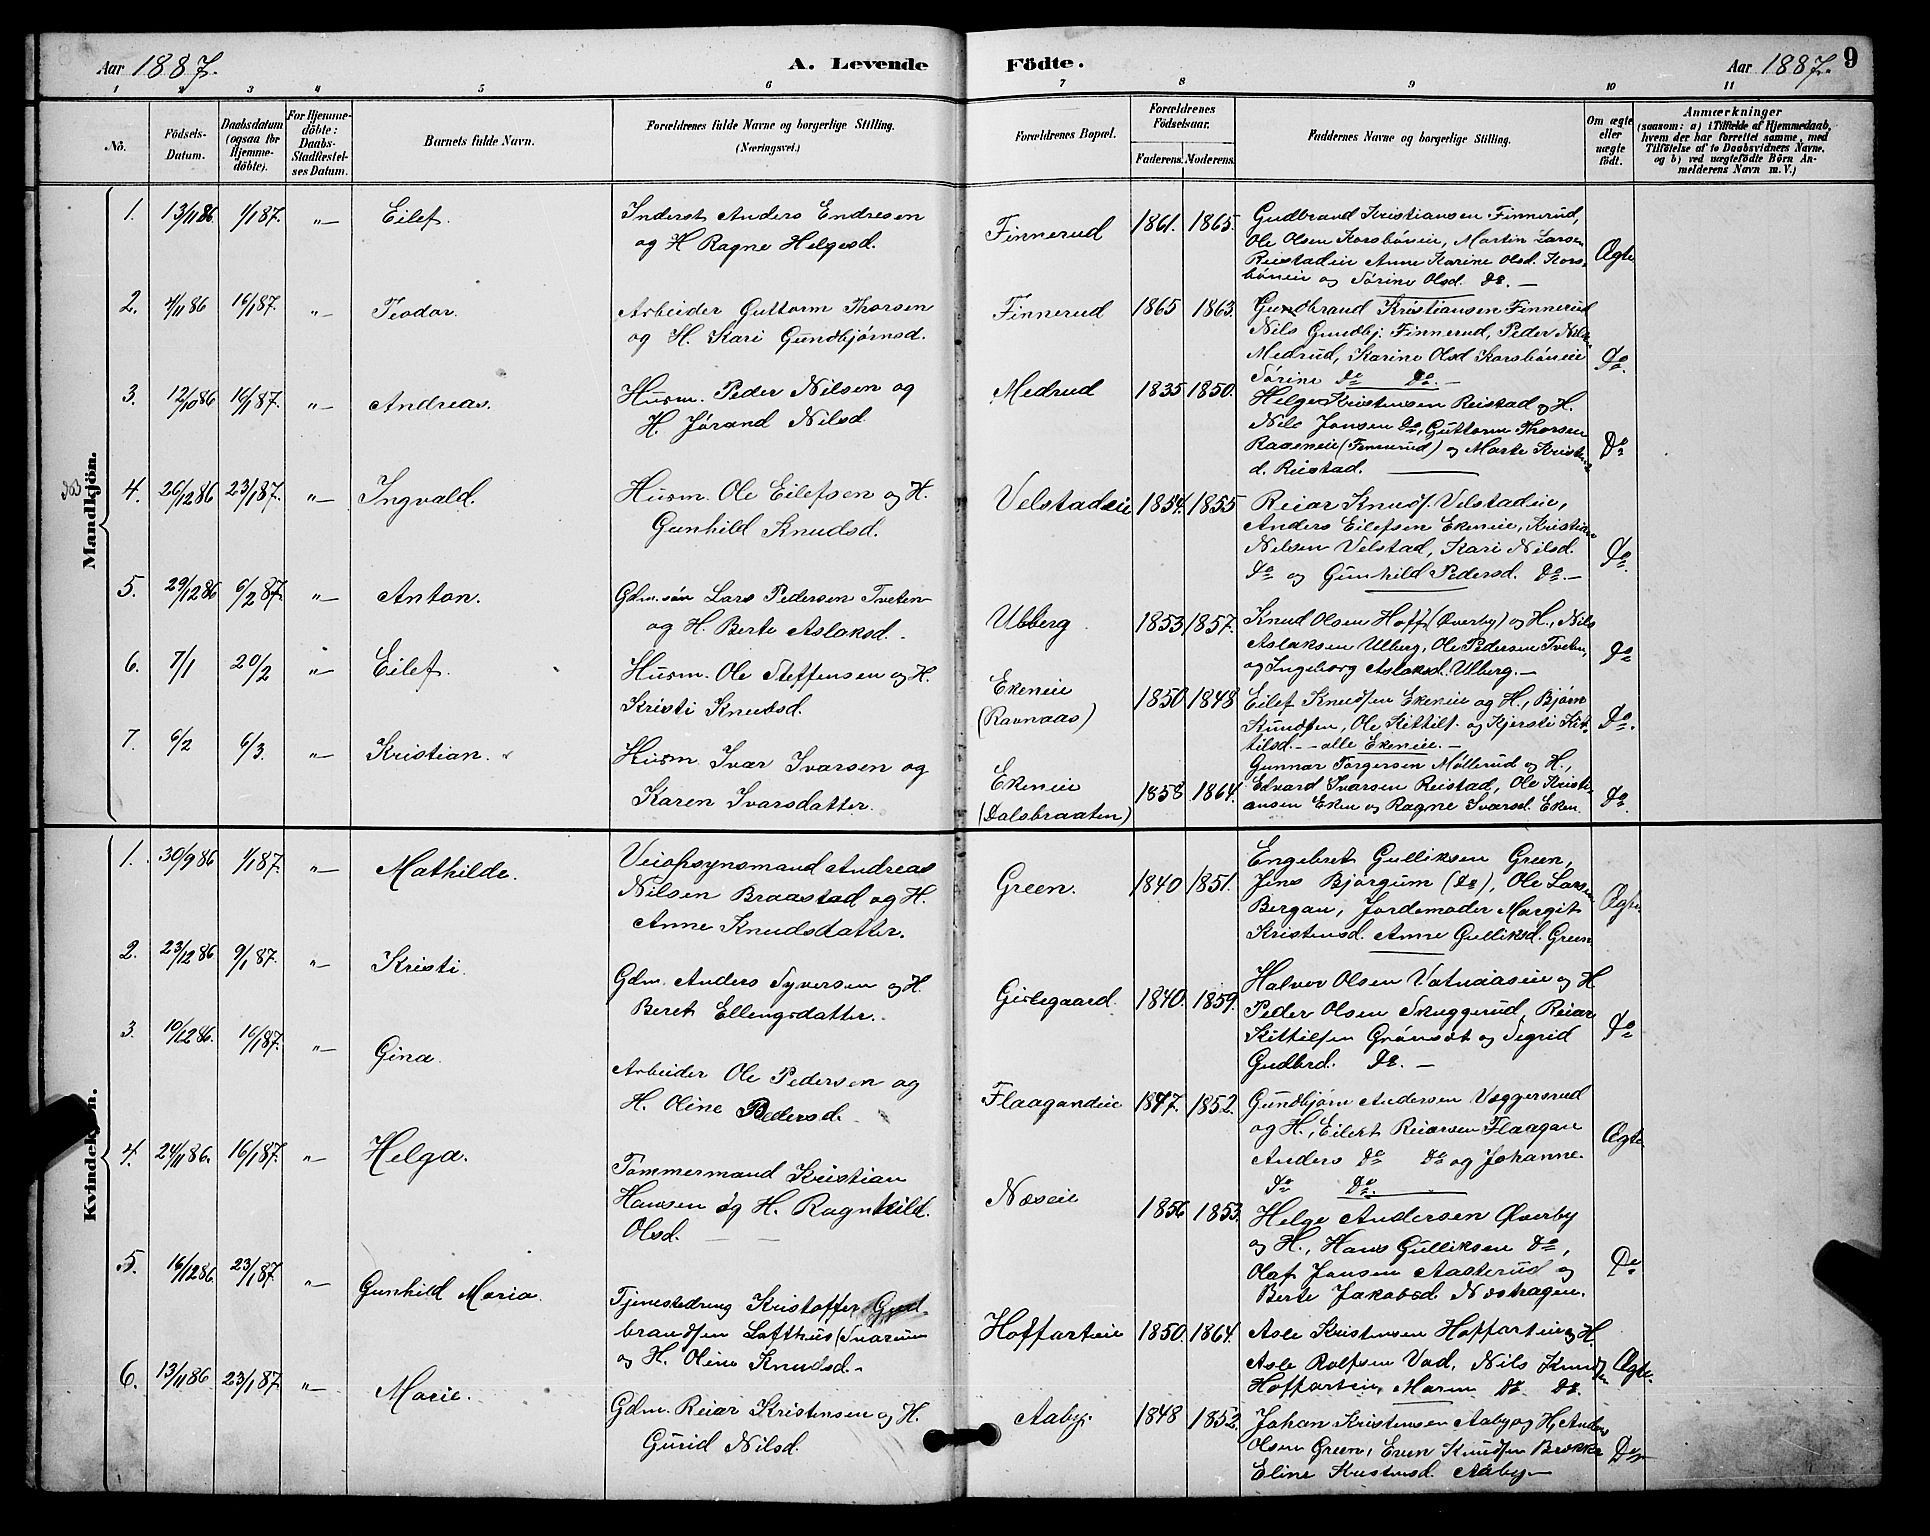 SAKO, Sigdal kirkebøker, G/Ga/L0005: Klokkerbok nr. I 5, 1886-1900, s. 9